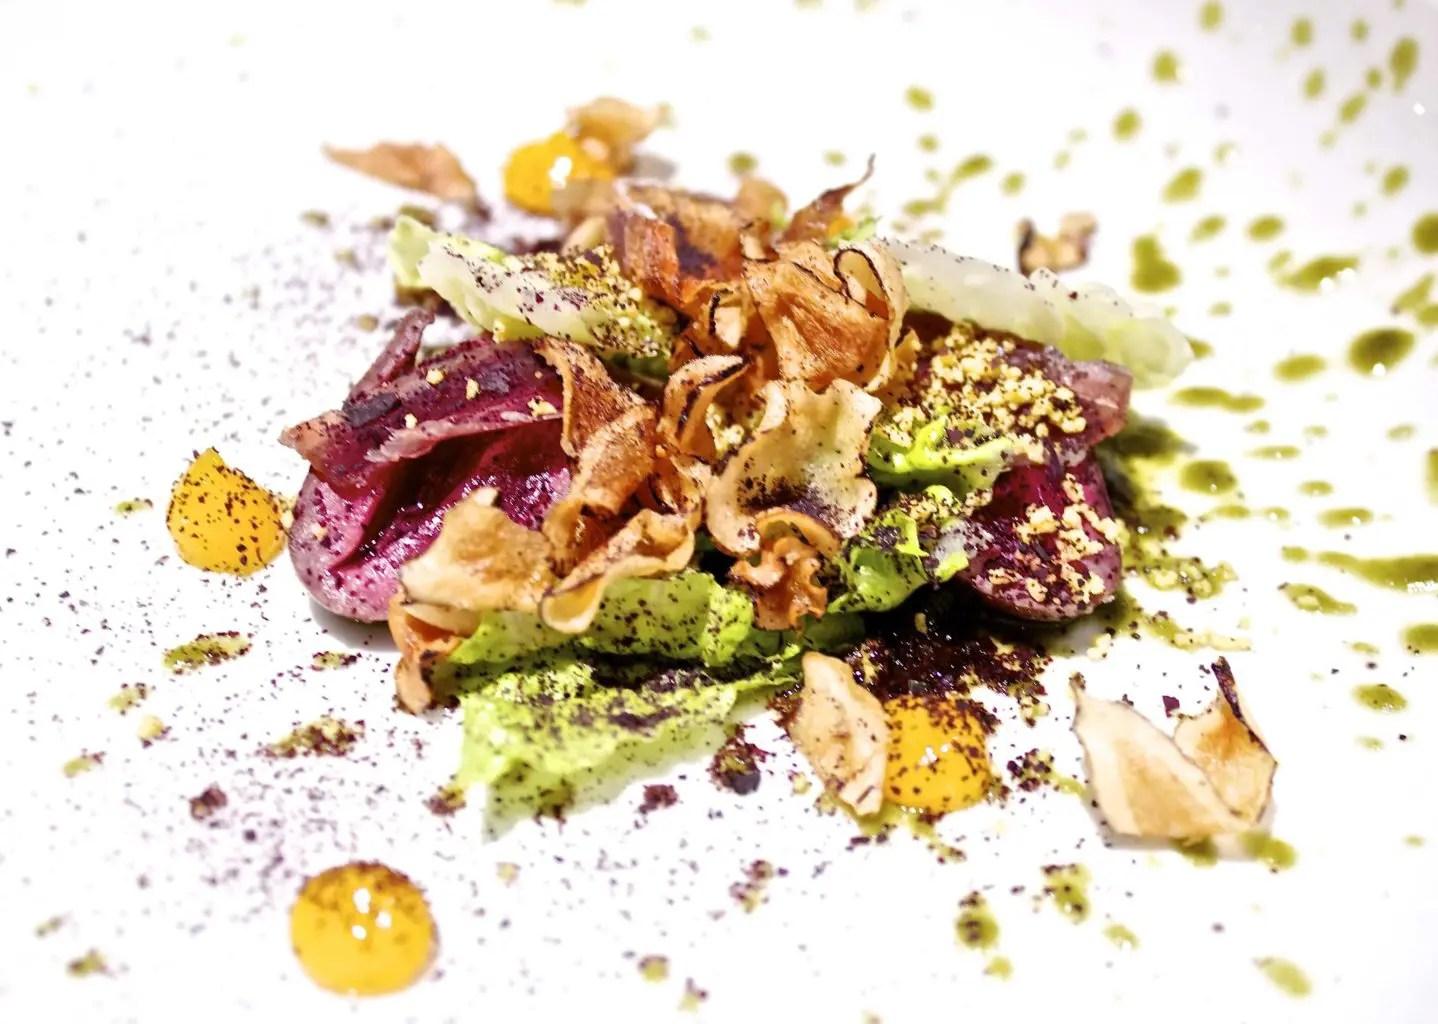 Restaurantomtale: Bare, Bergen lavFODMAP